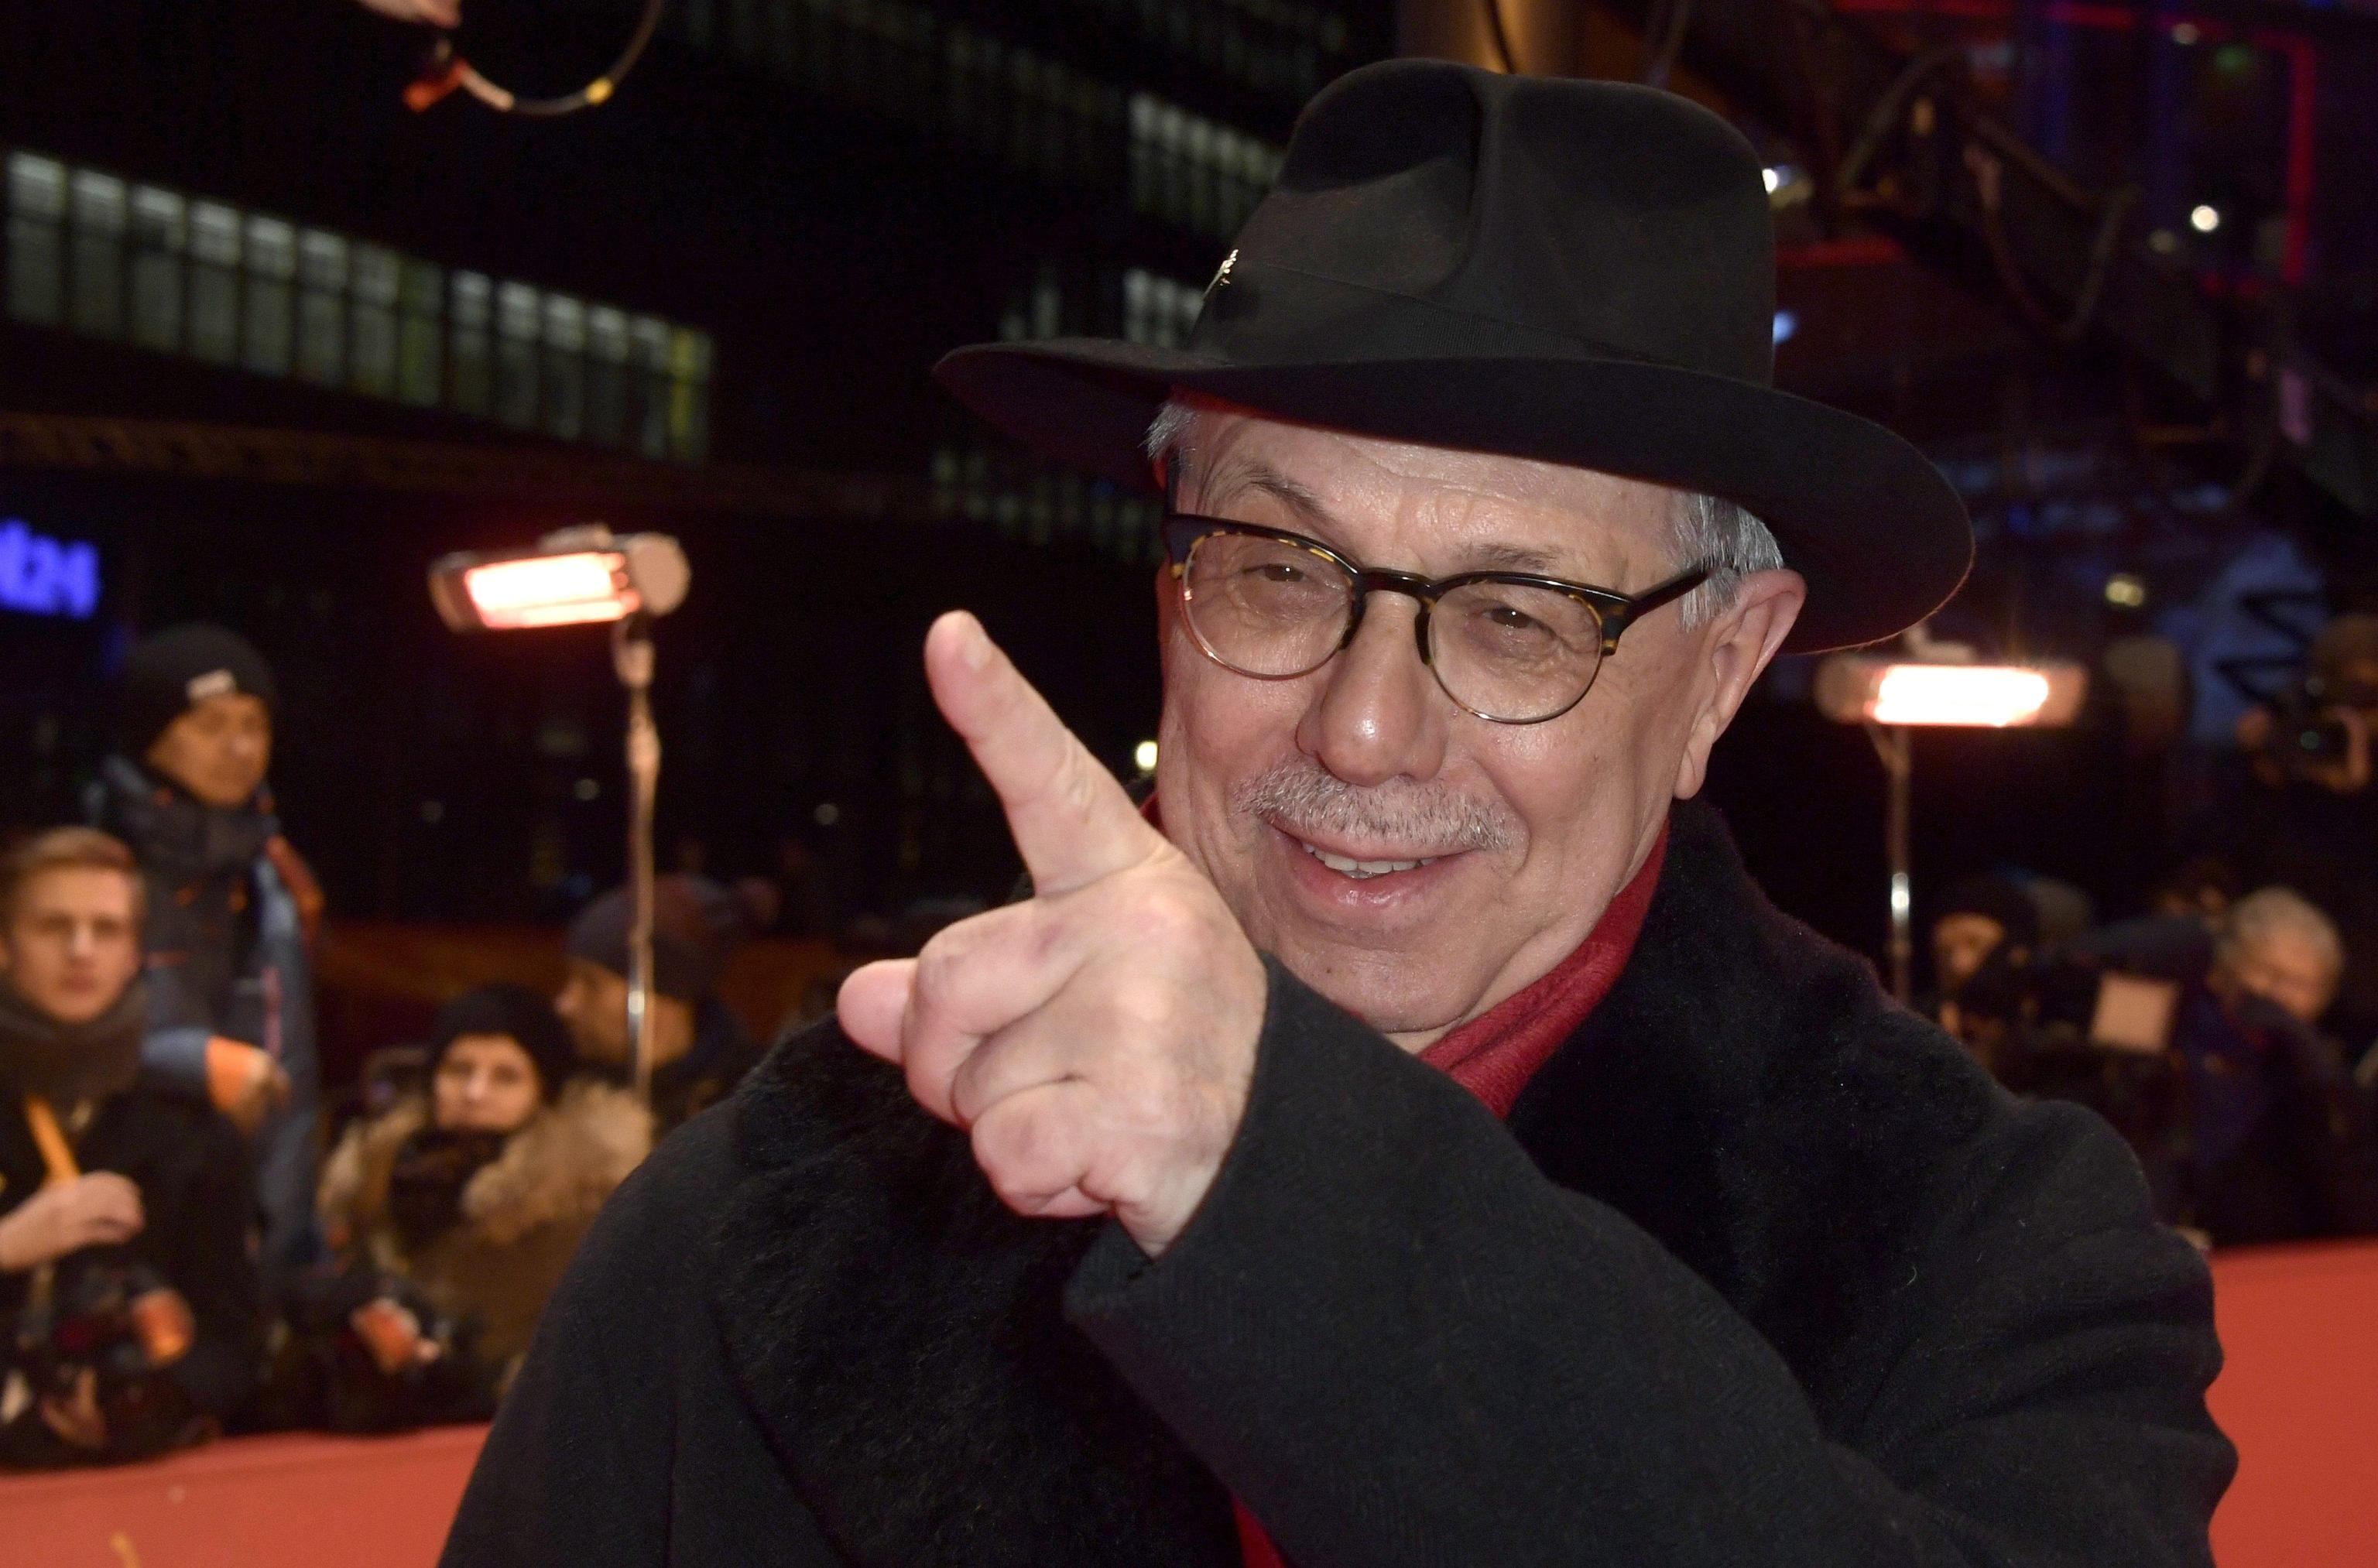 Kosslick, nel 2019 lascio la Berlinale